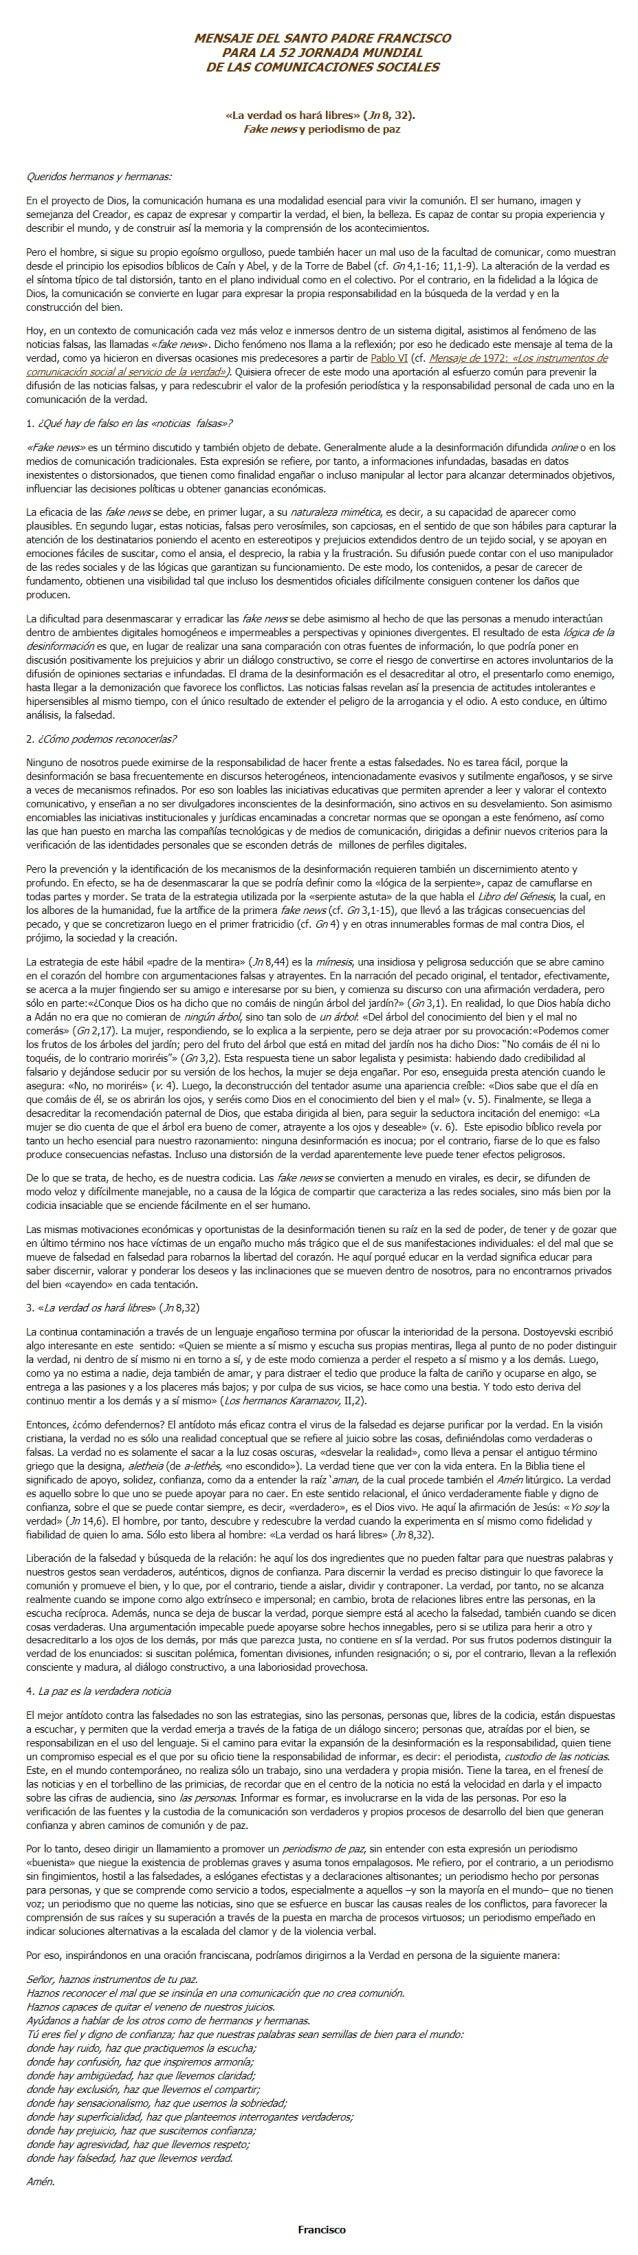 Francisco llama a promover un periodismo de paz